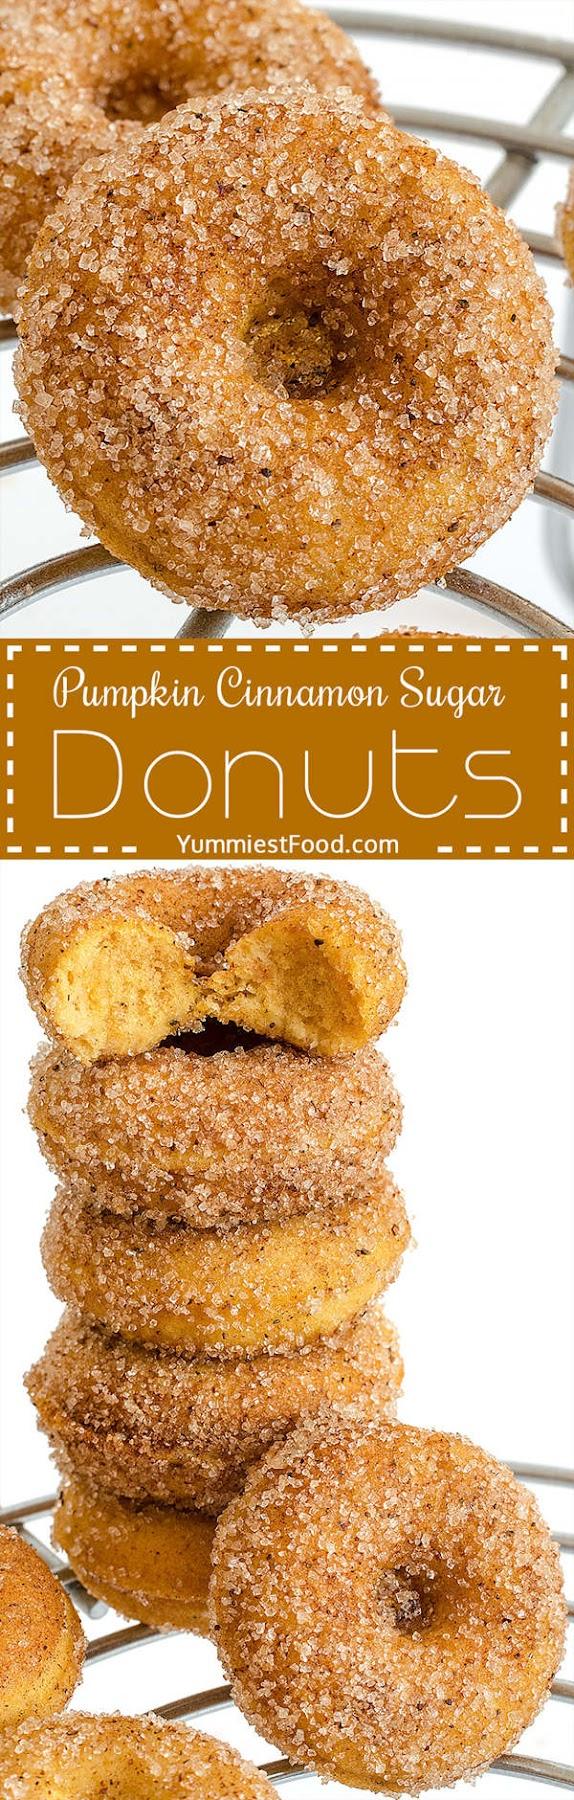 Pumpkin Cinnamon Sugar Donuts Recipe